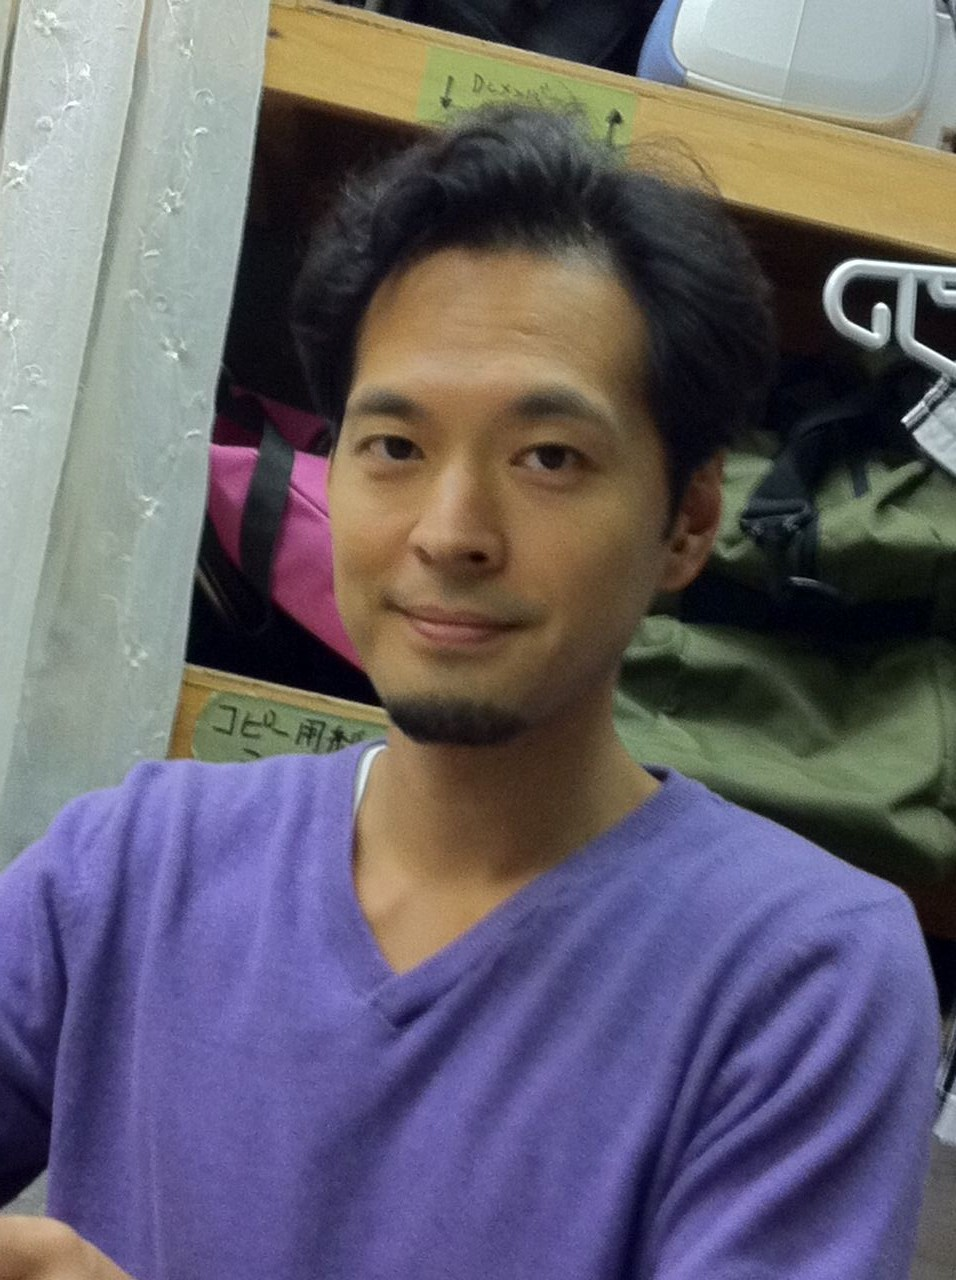 川島得愛の画像 p1_28